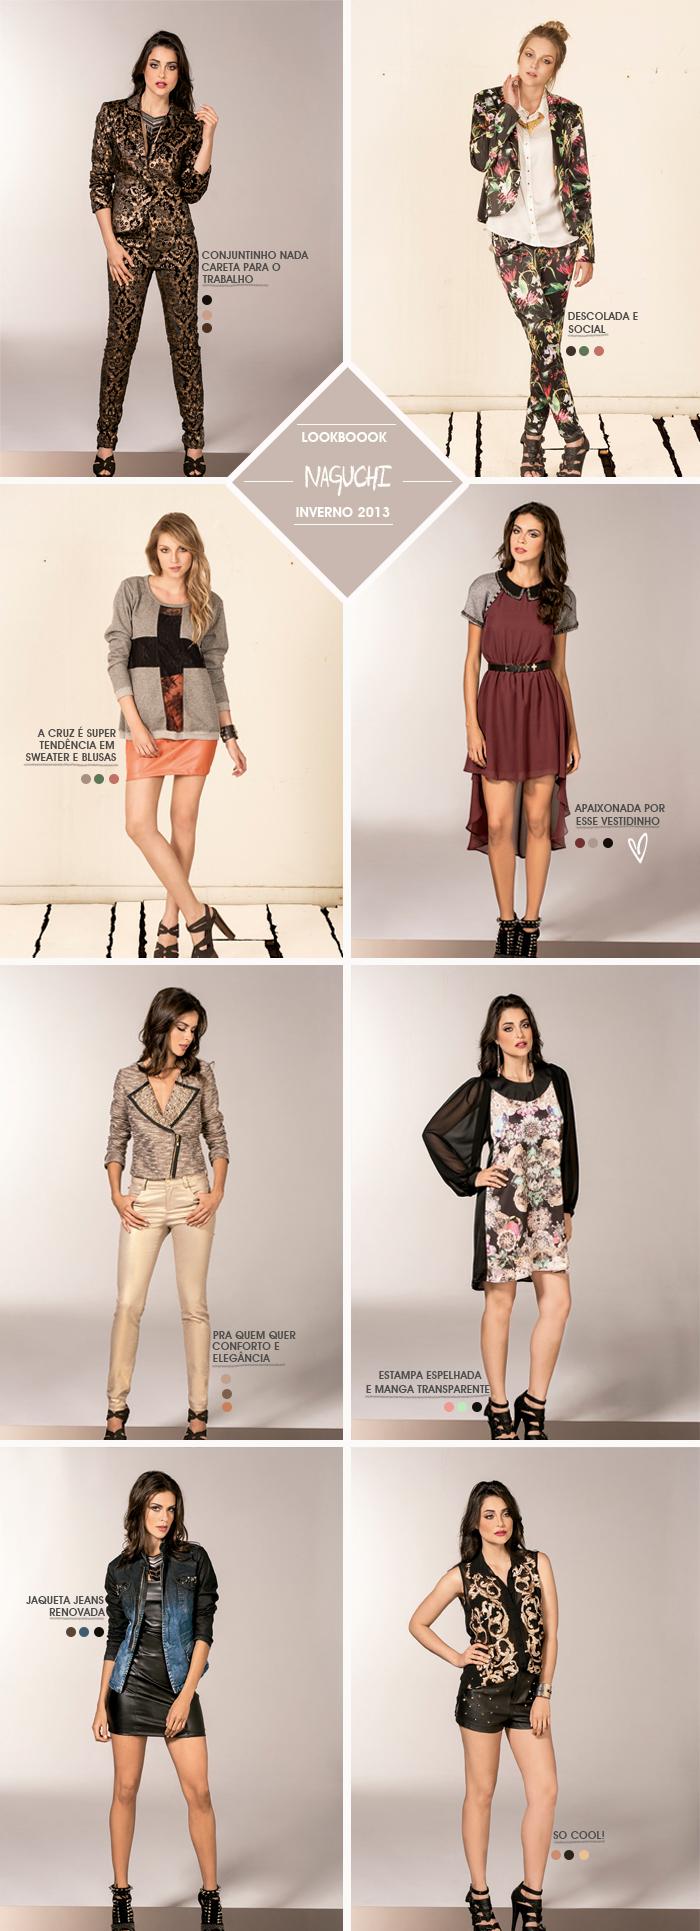 Lookbook de inverno 2013 Naguchi Dicas de moda Fashion Blog MeninaIT